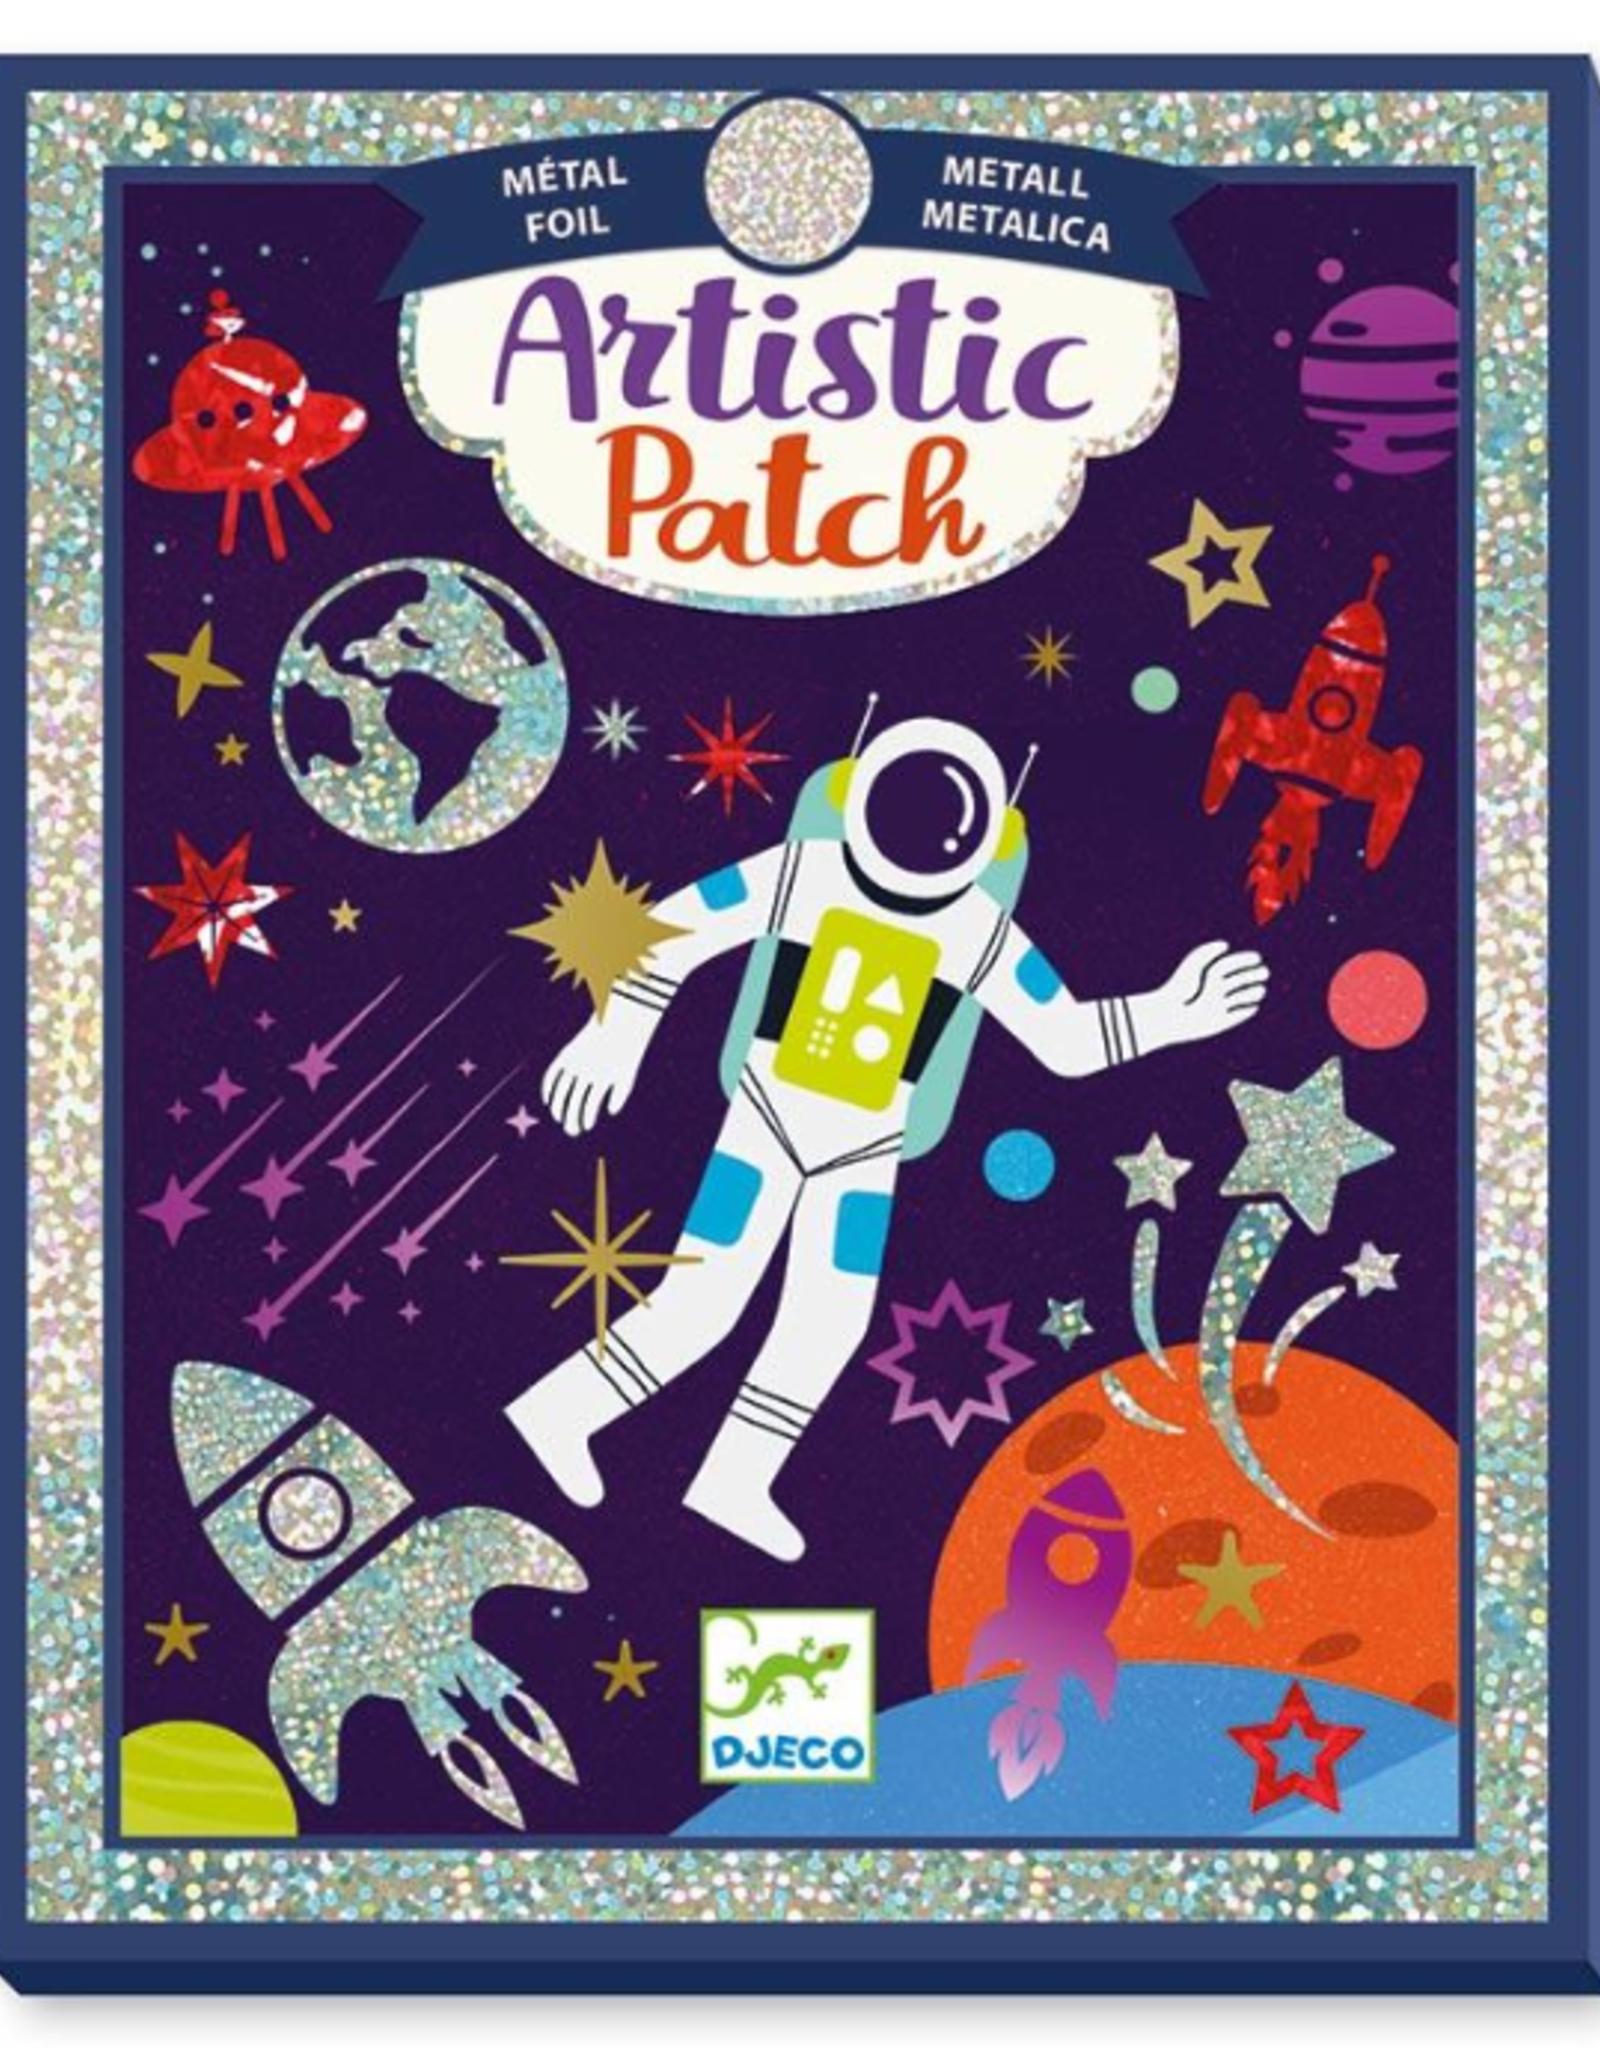 Djeco Artistic Patch: Cosmos Matellic